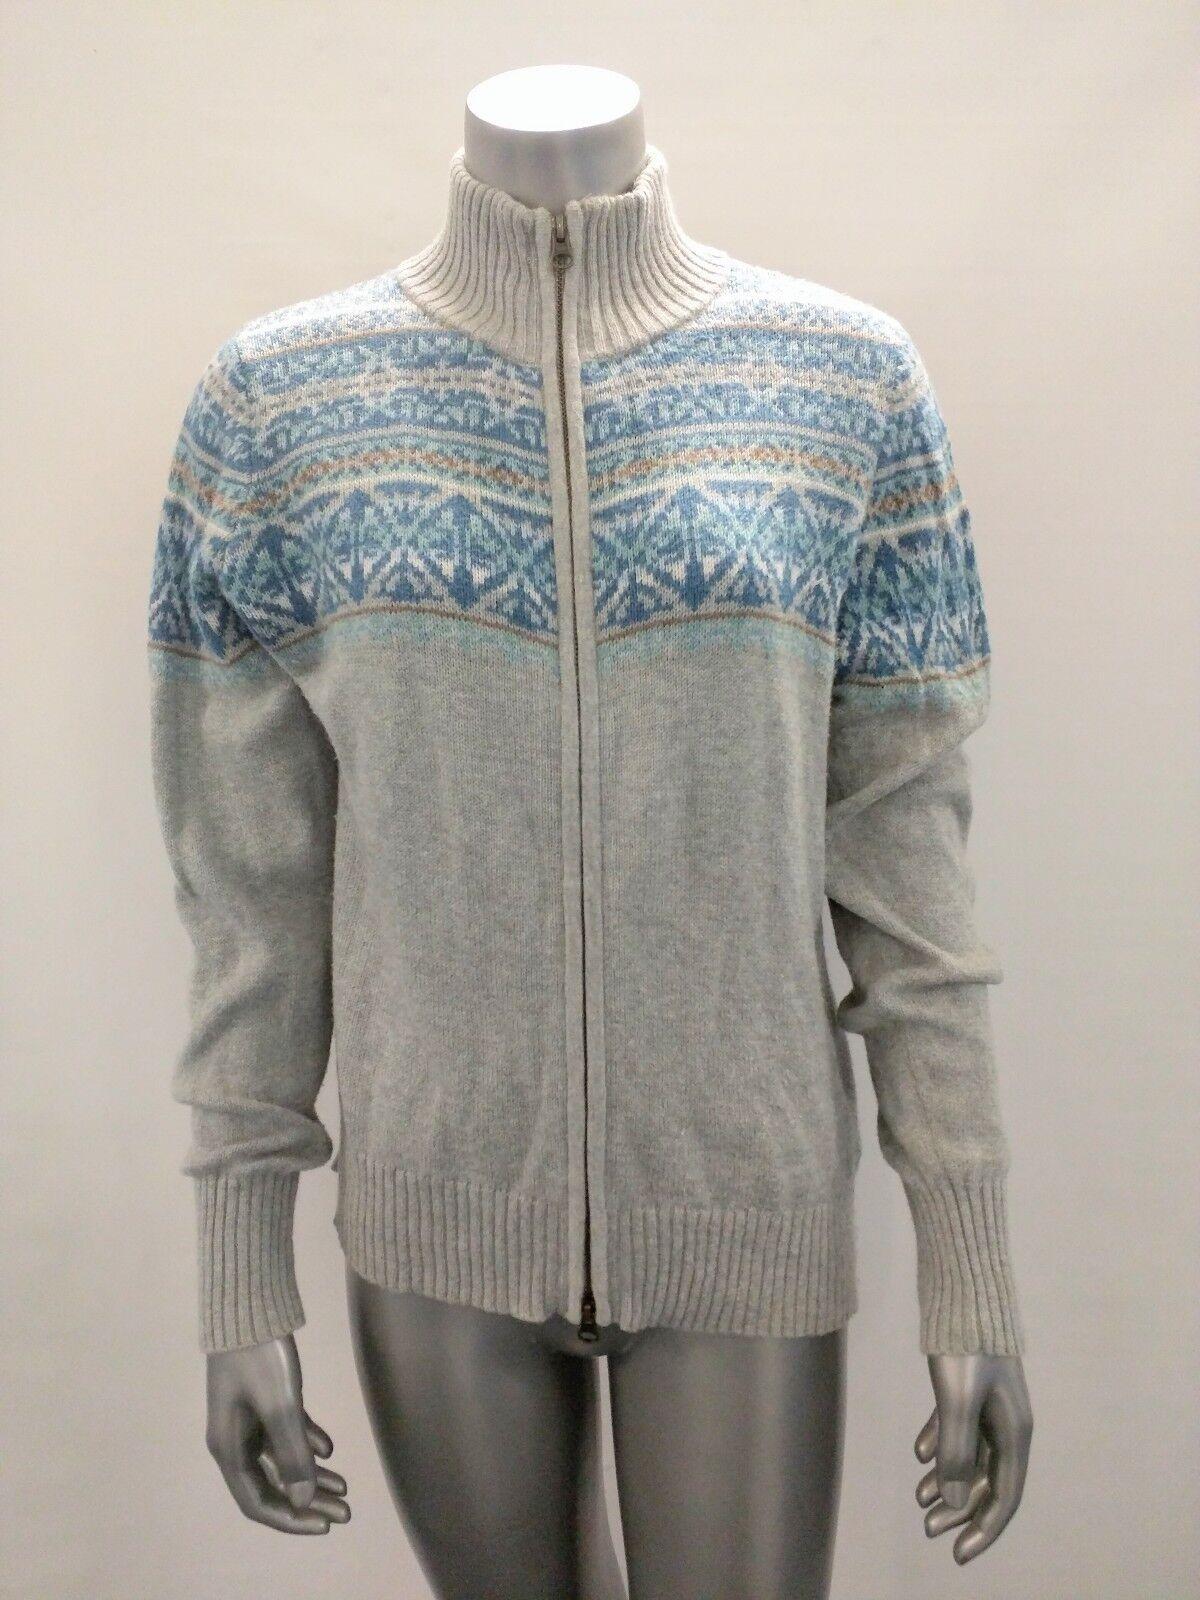 EDDIE BAUER womens sweater PETITE LARGE